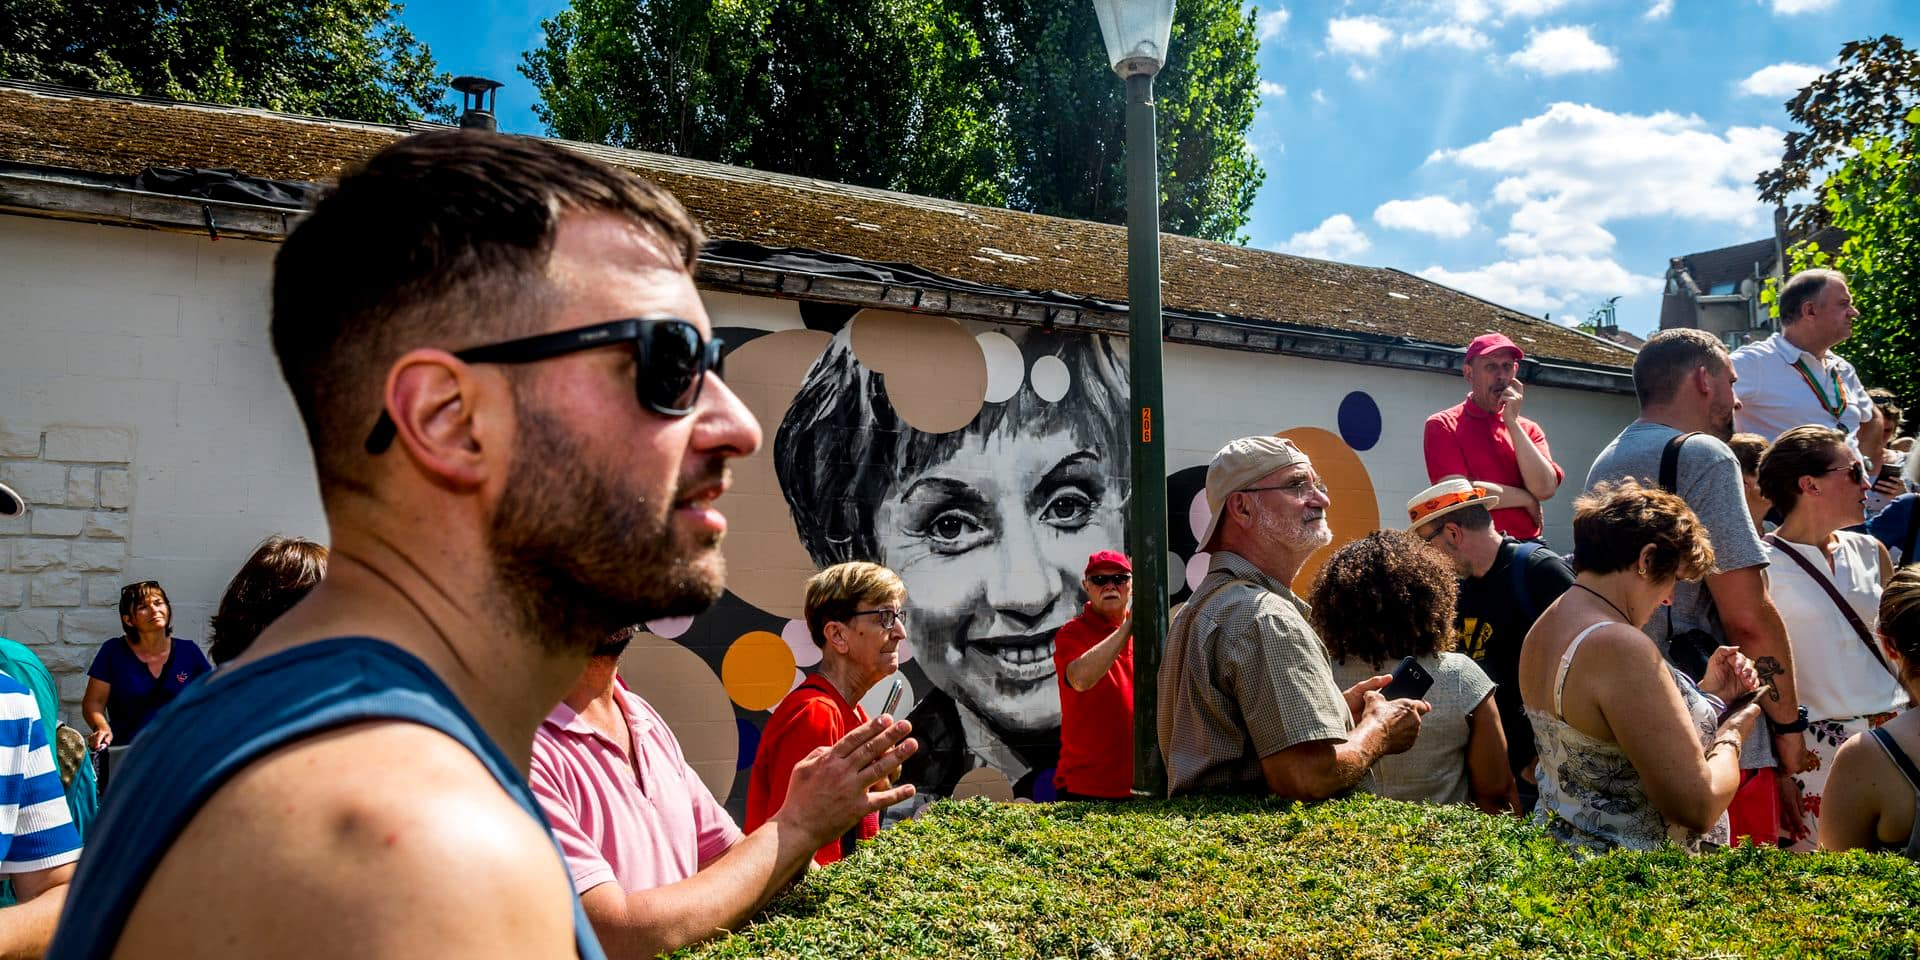 L'art urbain transforme Bruxelles en musée en plein air